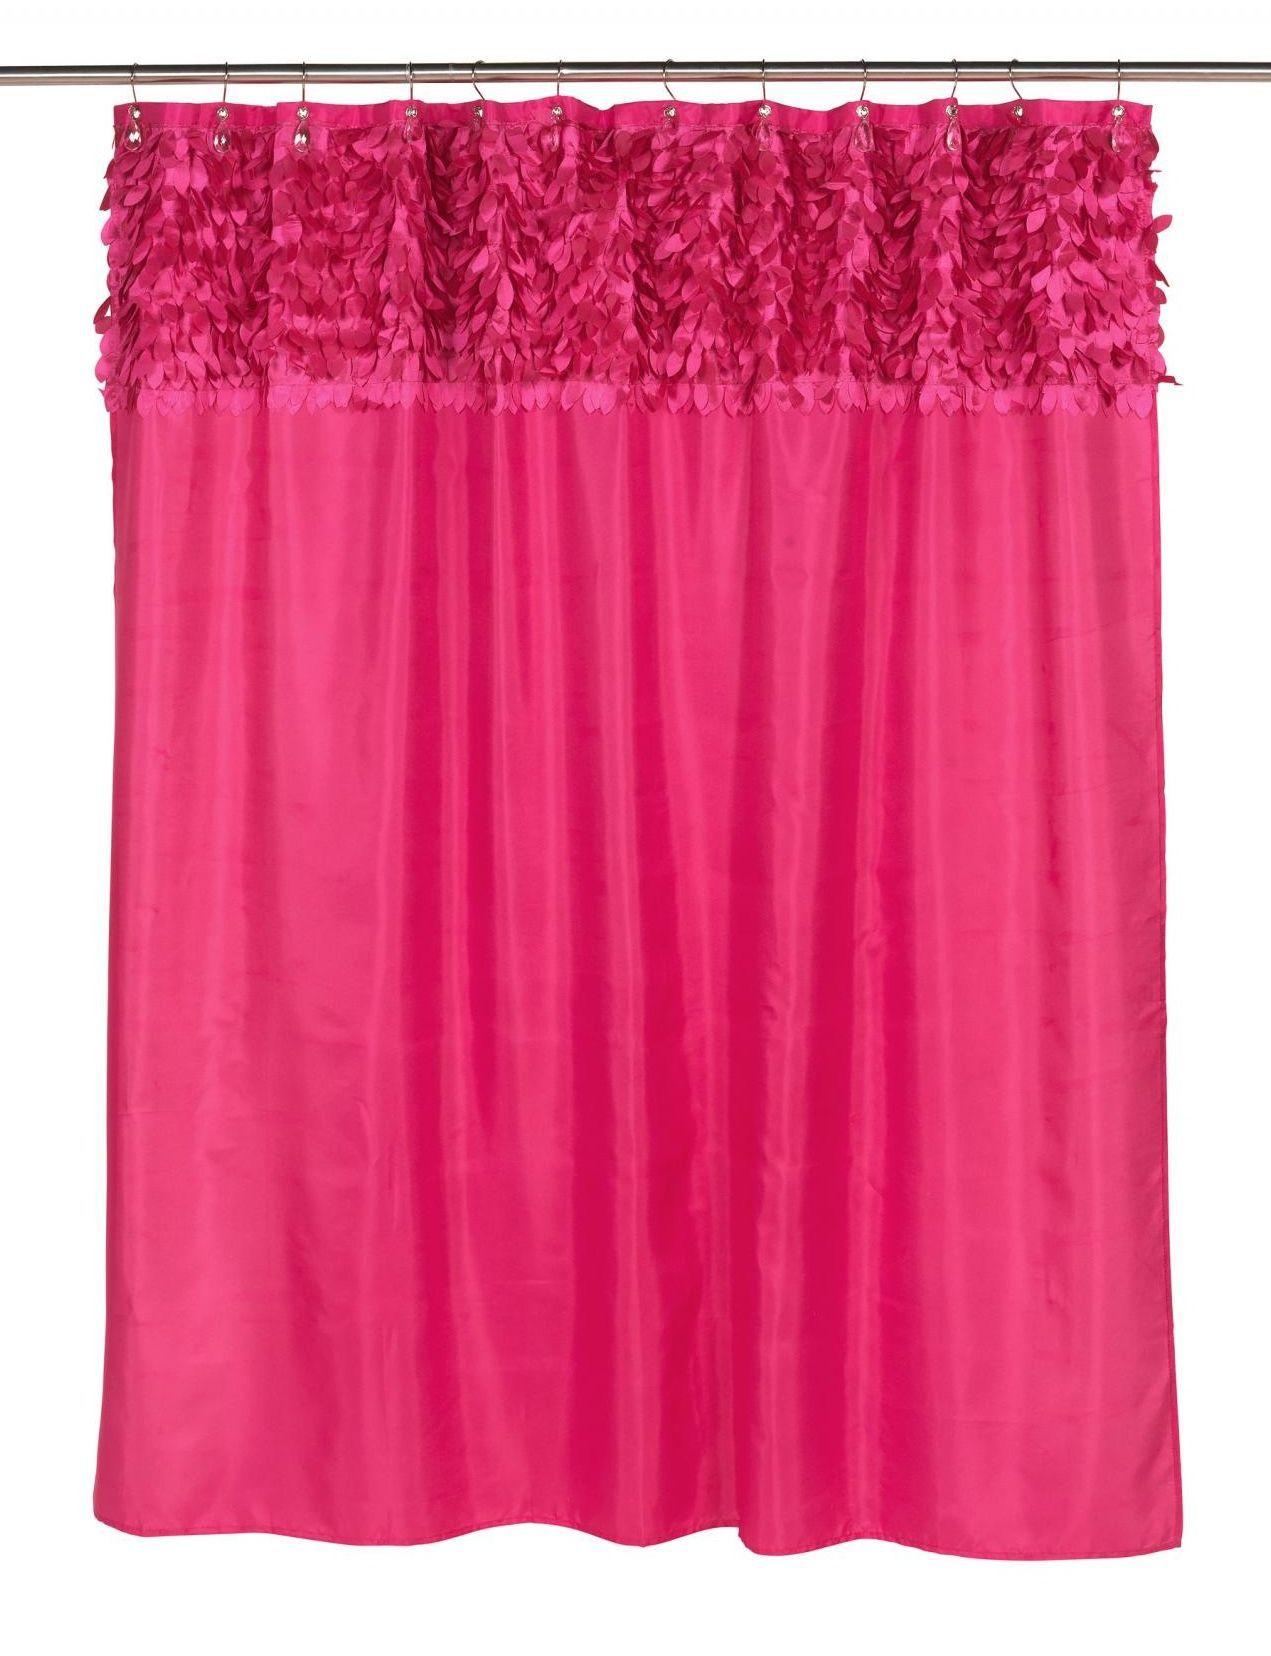 Шторки для ванной Шторка для ванной 178x183 Carnation Home Fashions Jasmine Raspberry elitnaya-shtorka-dlya-vannoy-jasmine-raspberry-ot-carnation-home-fashions-ssha-kitay.jpg